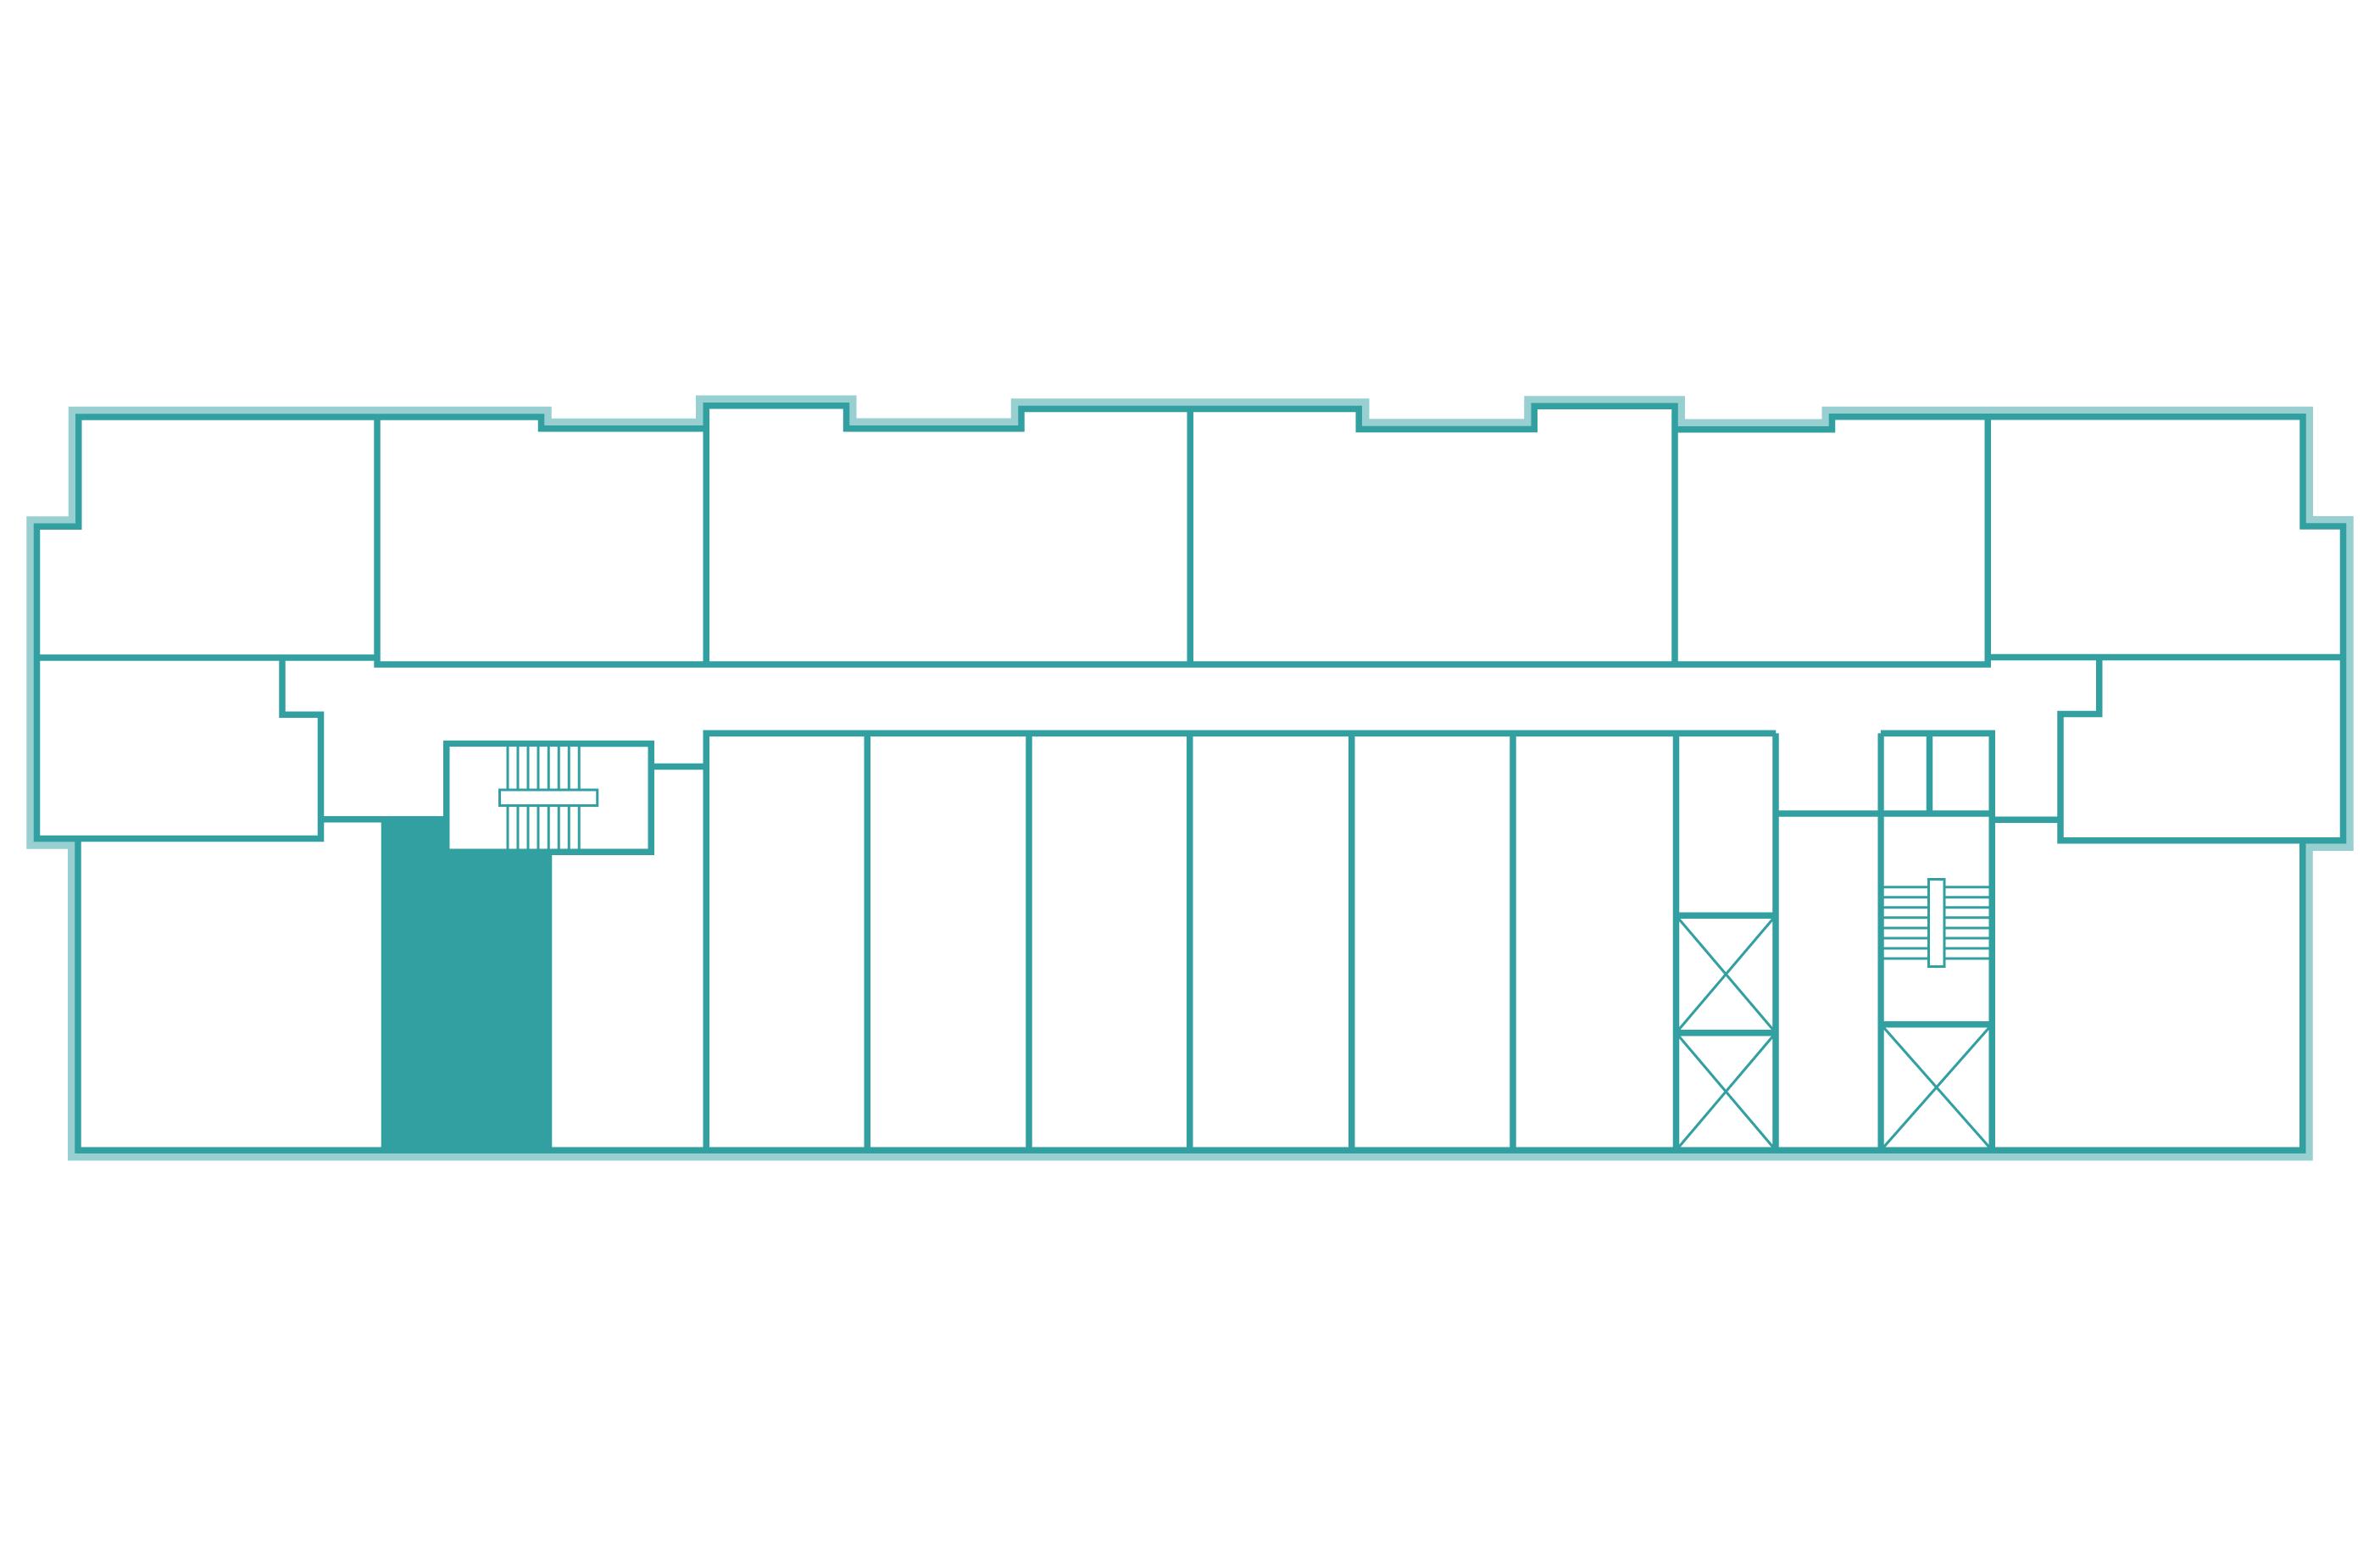 floorplan image of unit image 0608